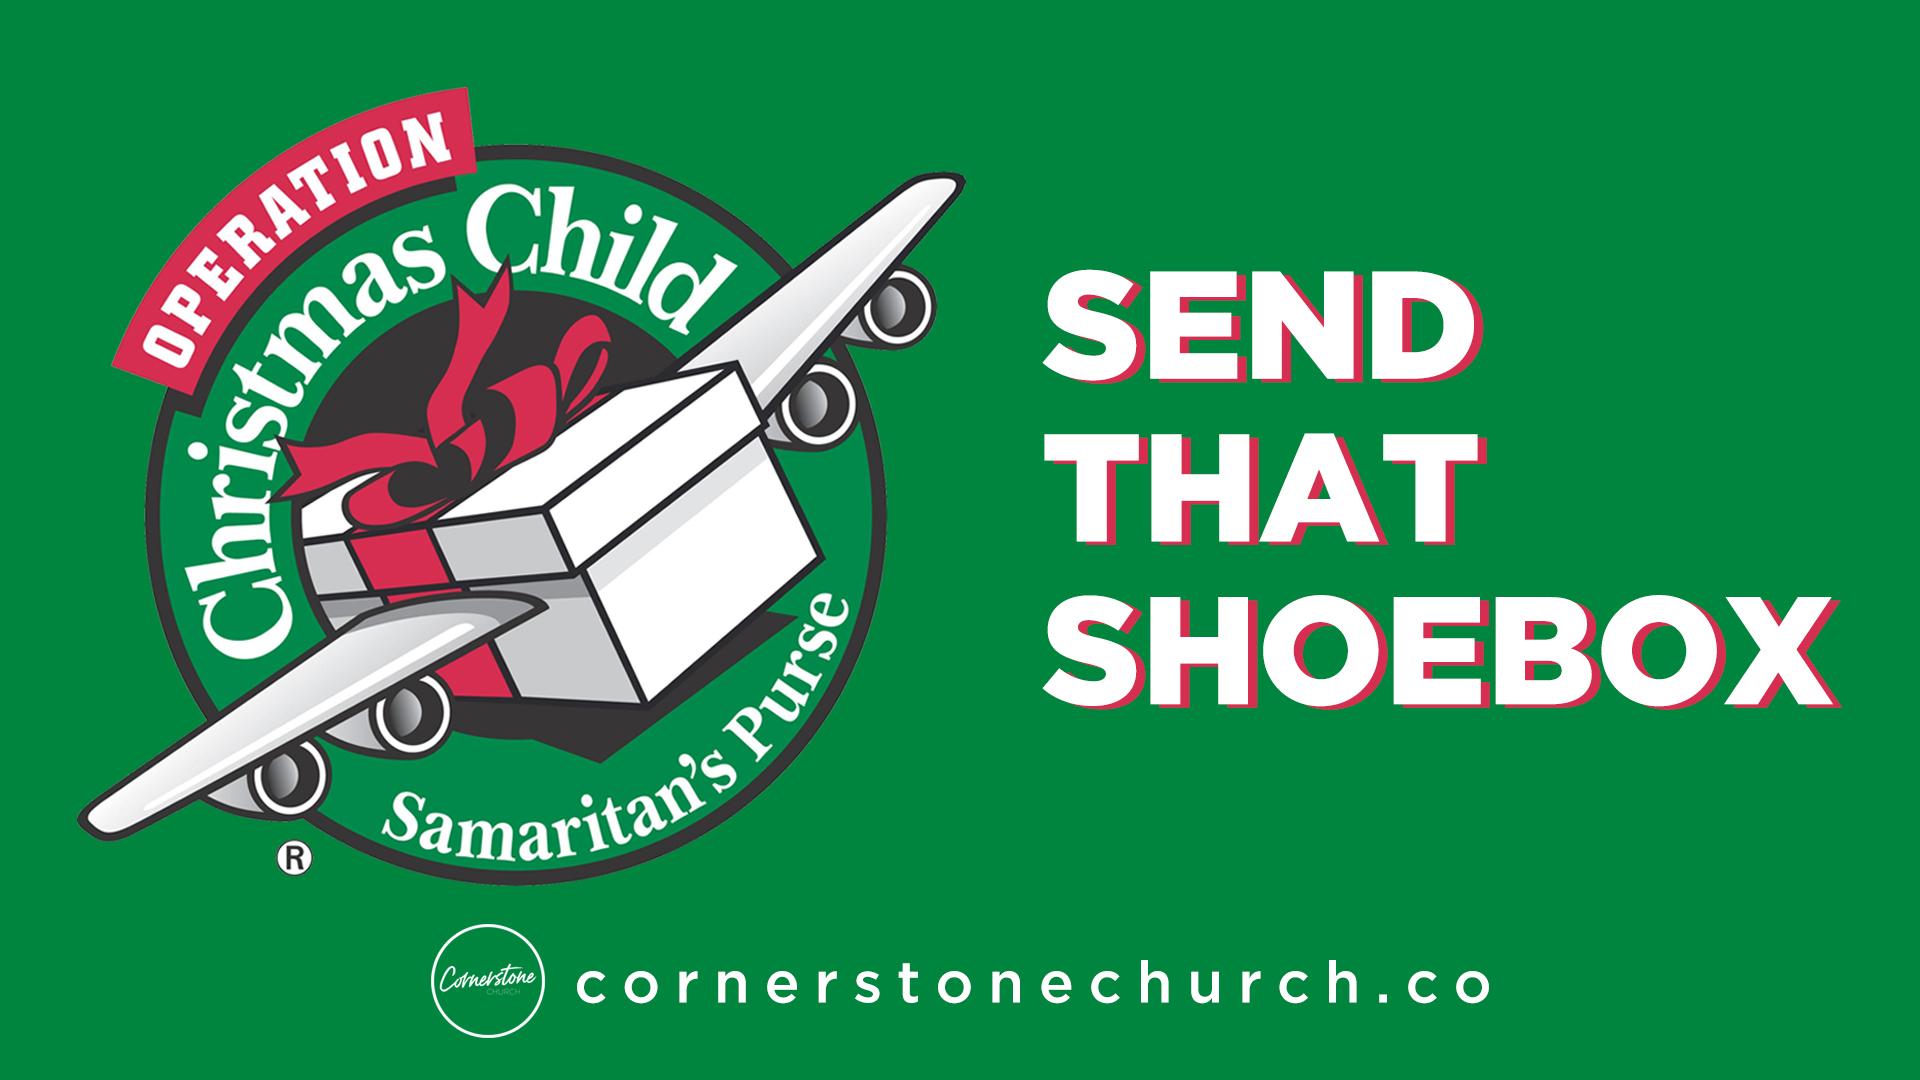 Operation Christmas Child Logo.Operation Christmas Child